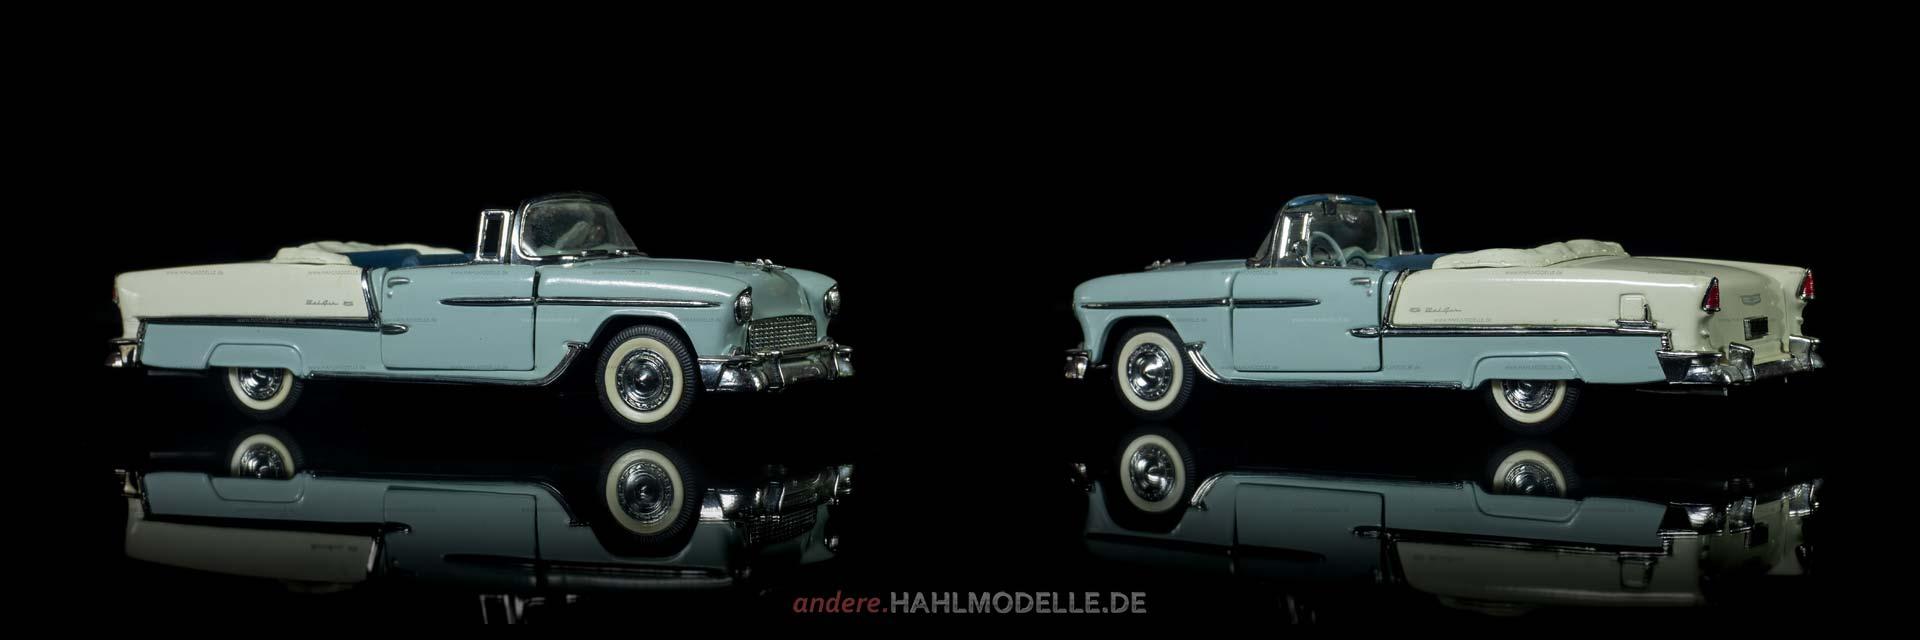 Chevrolet Bel Air (Serie 2400C) Convertible | Cabriolet | Franklin Mint Precision Models | 1:43 | www.andere.hahlmodelle.de